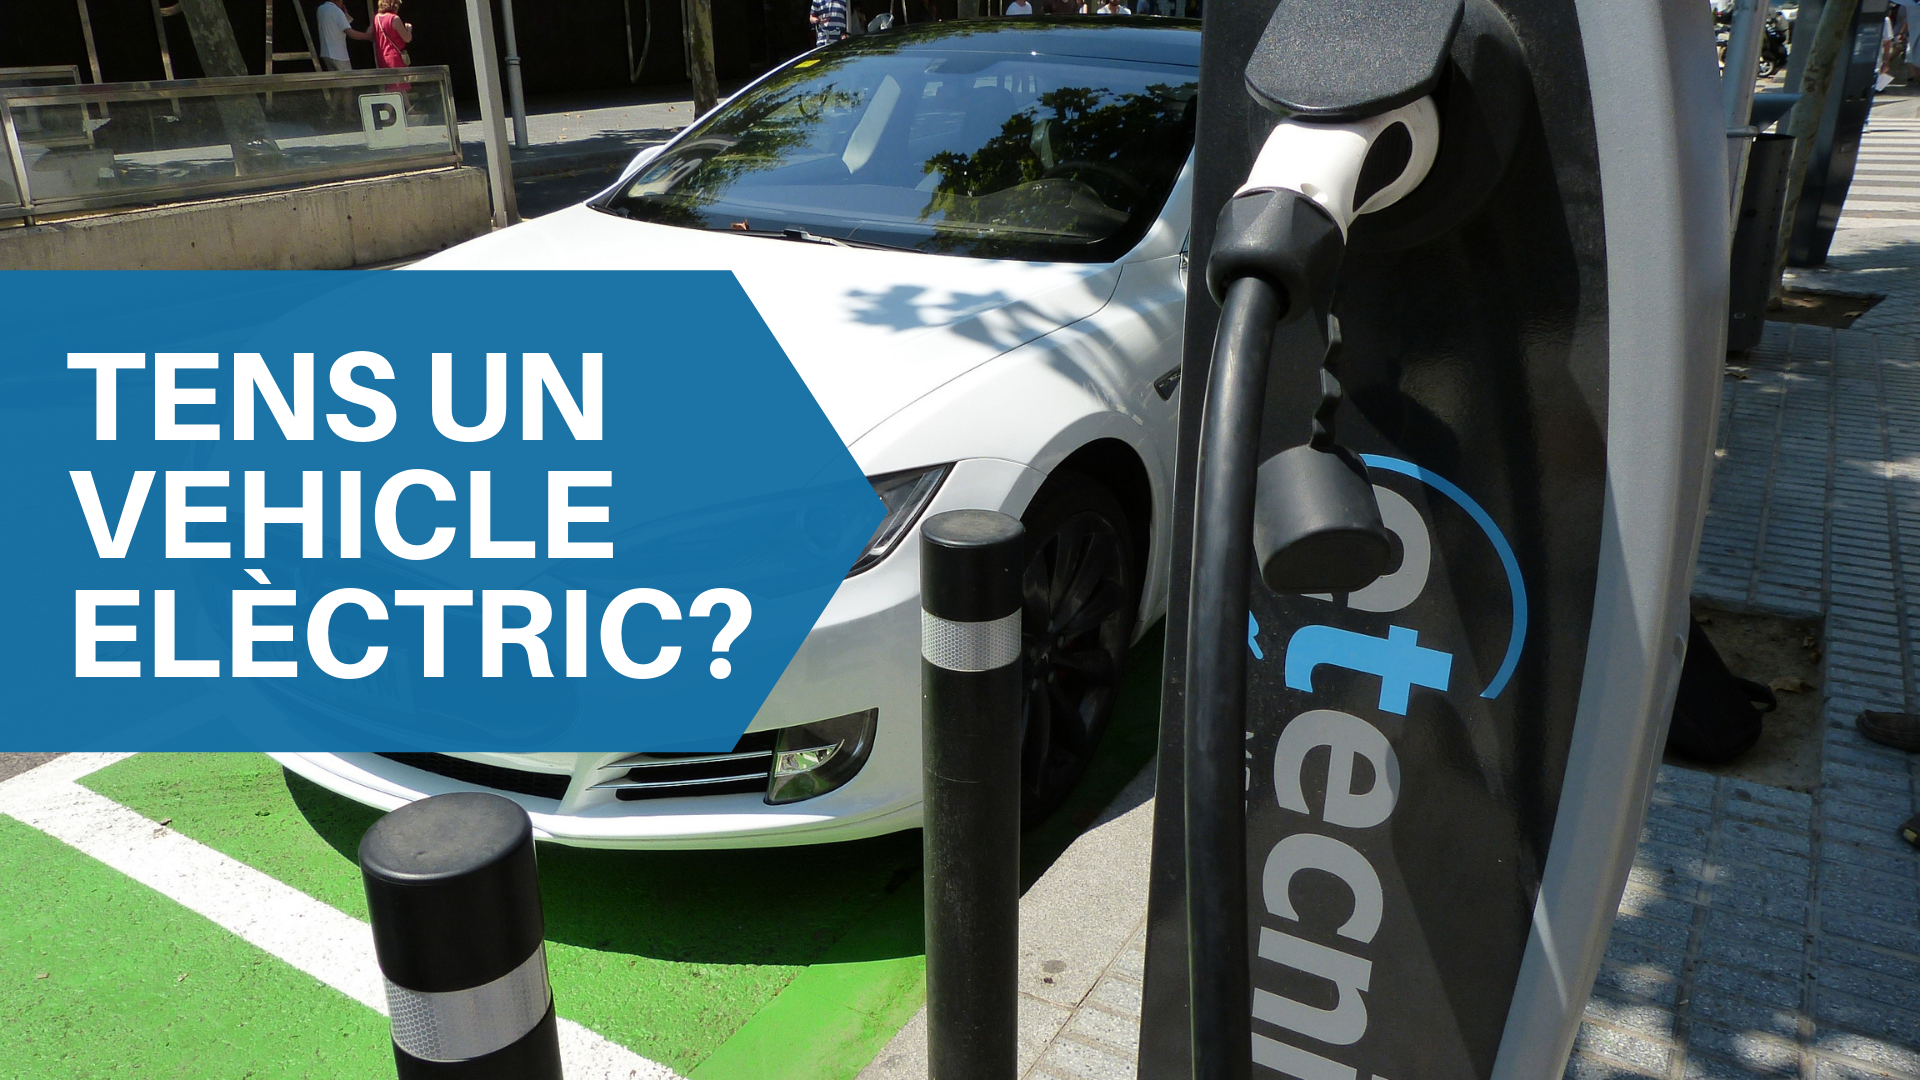 Tens un vehicle elèctric?